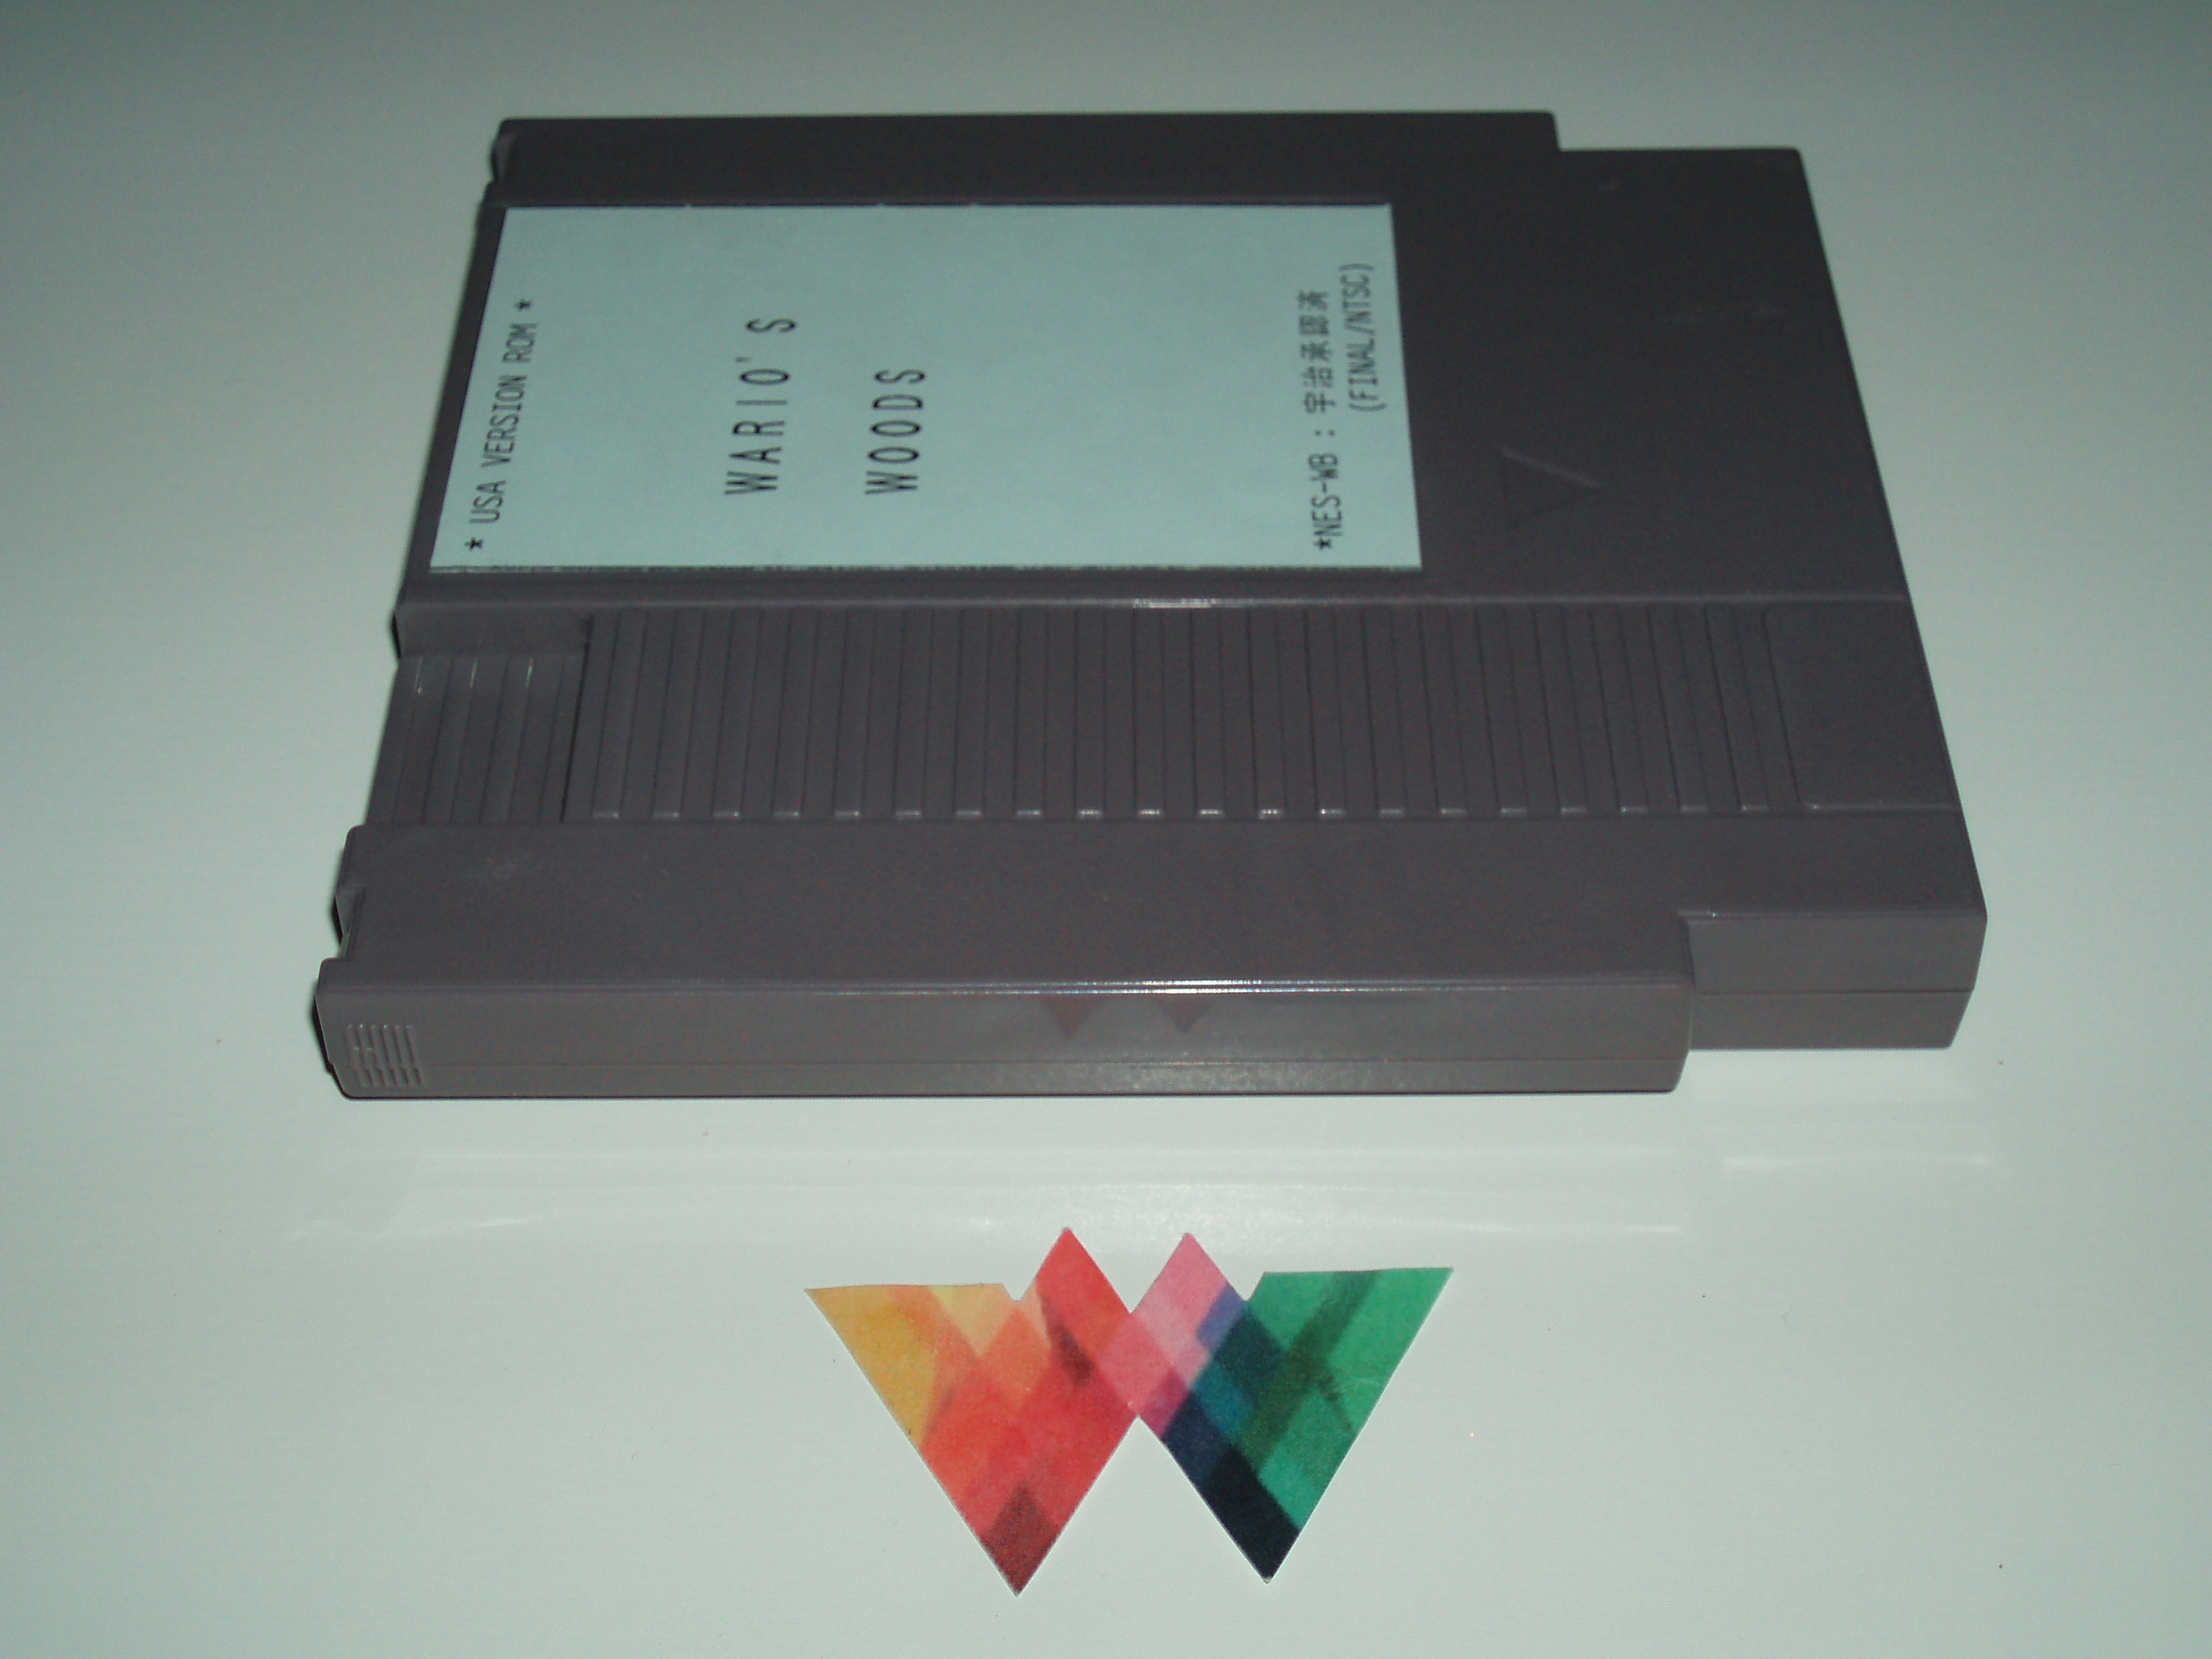 P1010096.JPG